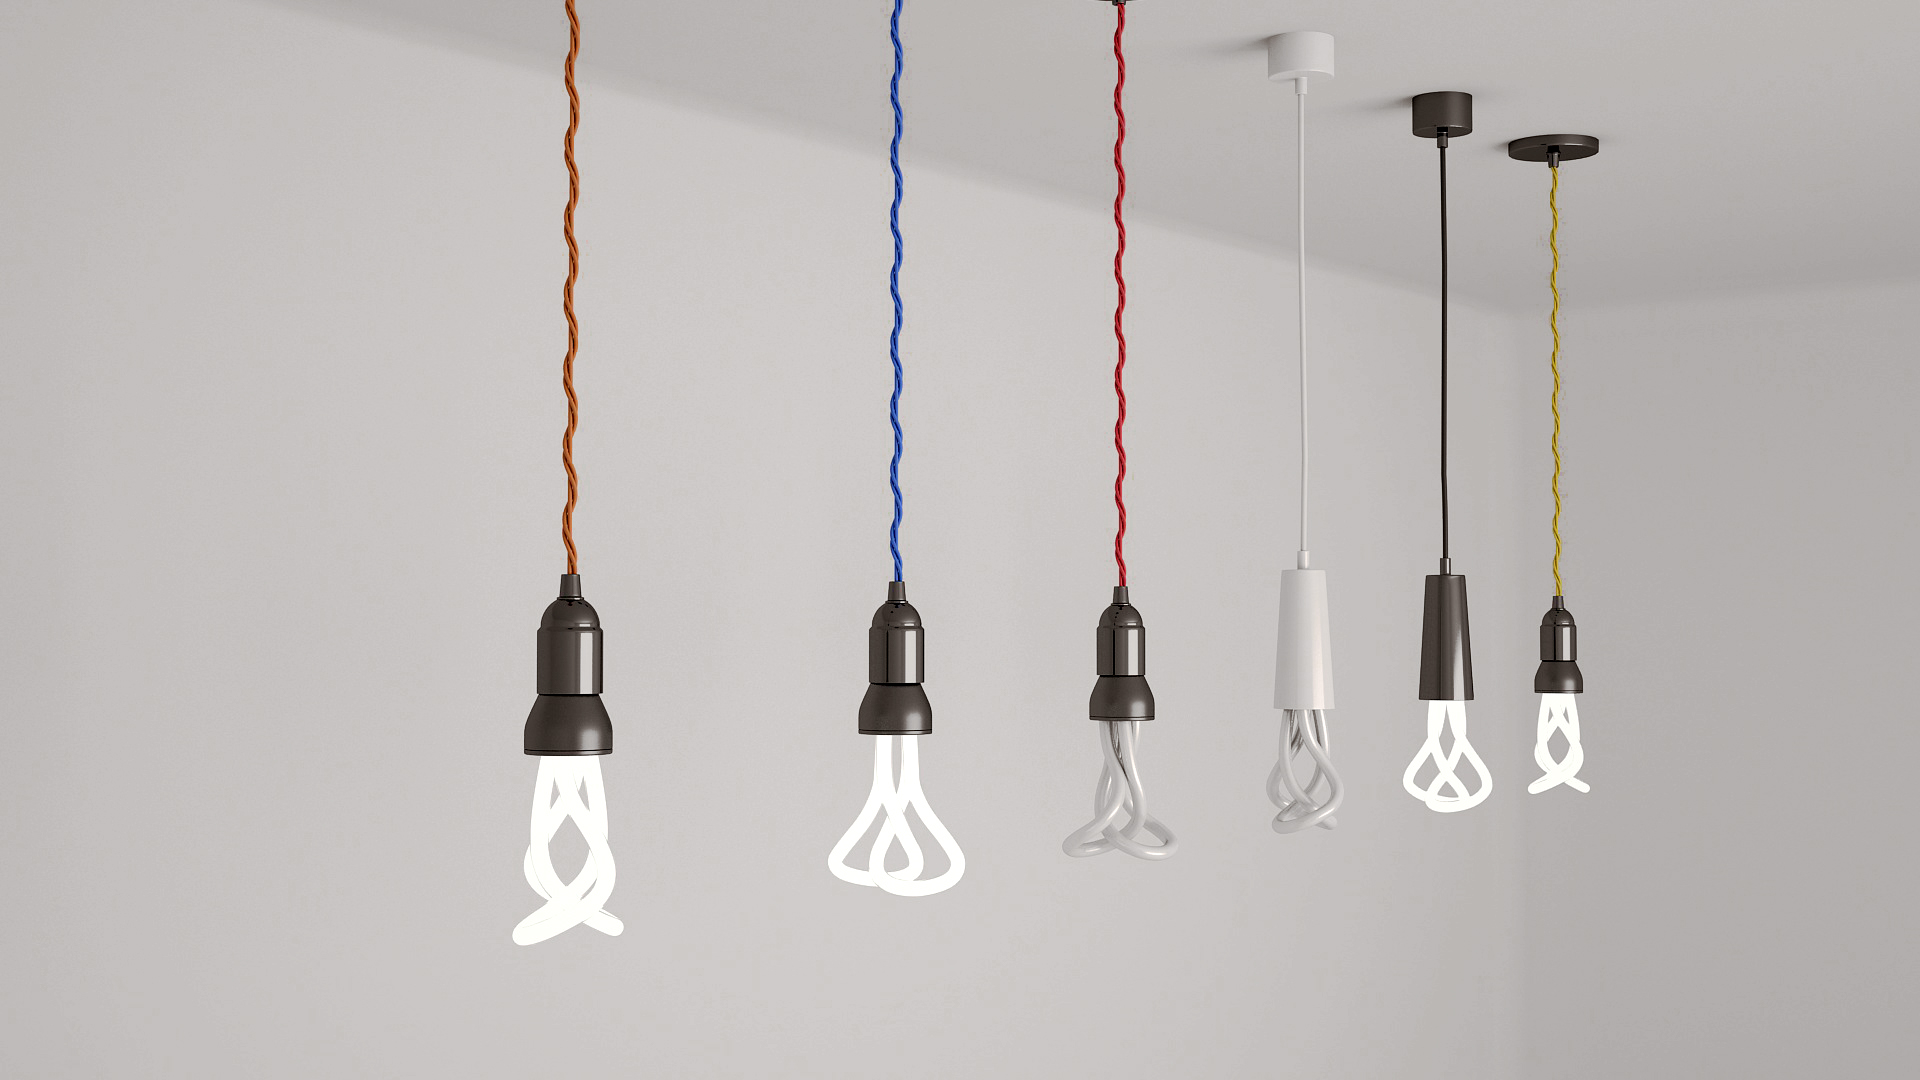 plumen light bulbs by ksenusya 3docean. Black Bedroom Furniture Sets. Home Design Ideas